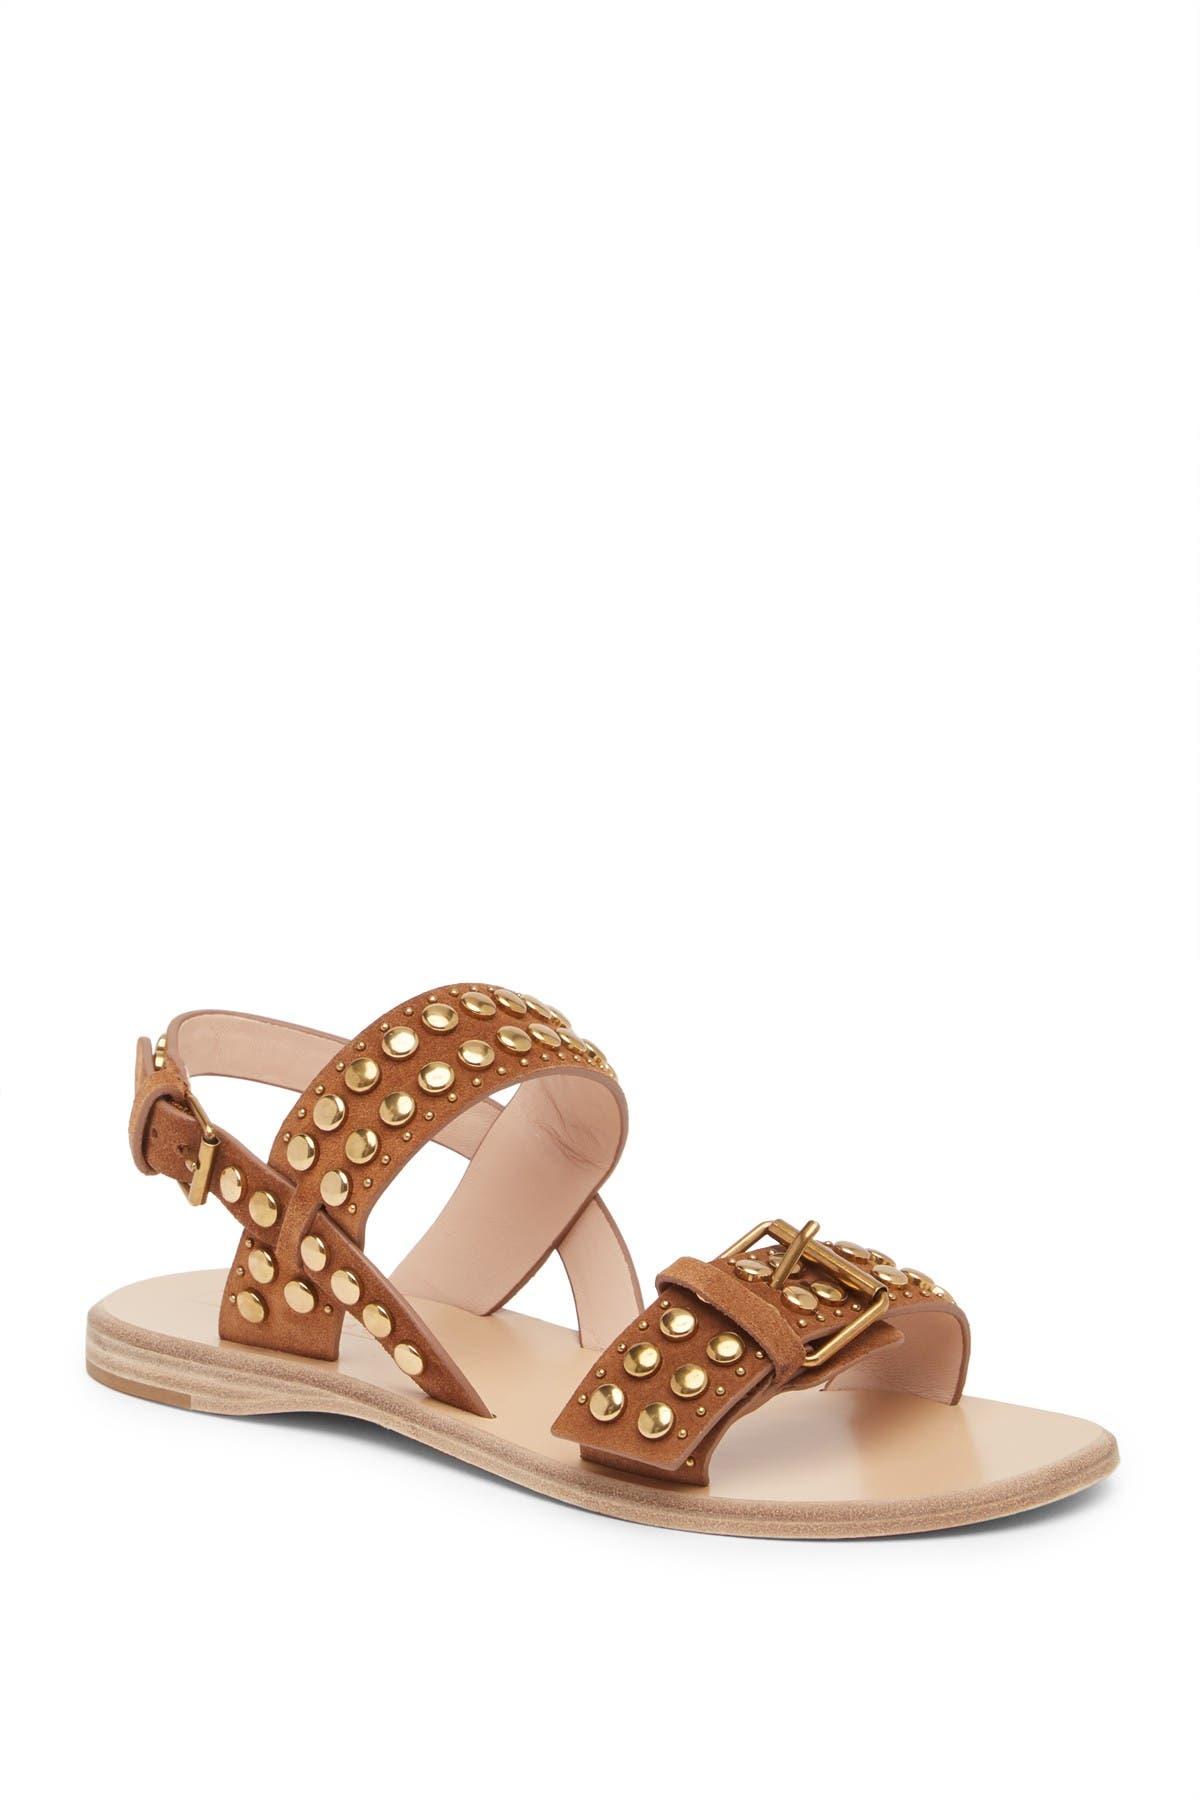 Image of Marc Jacobs Tawny Flat Studded Leather Sandal